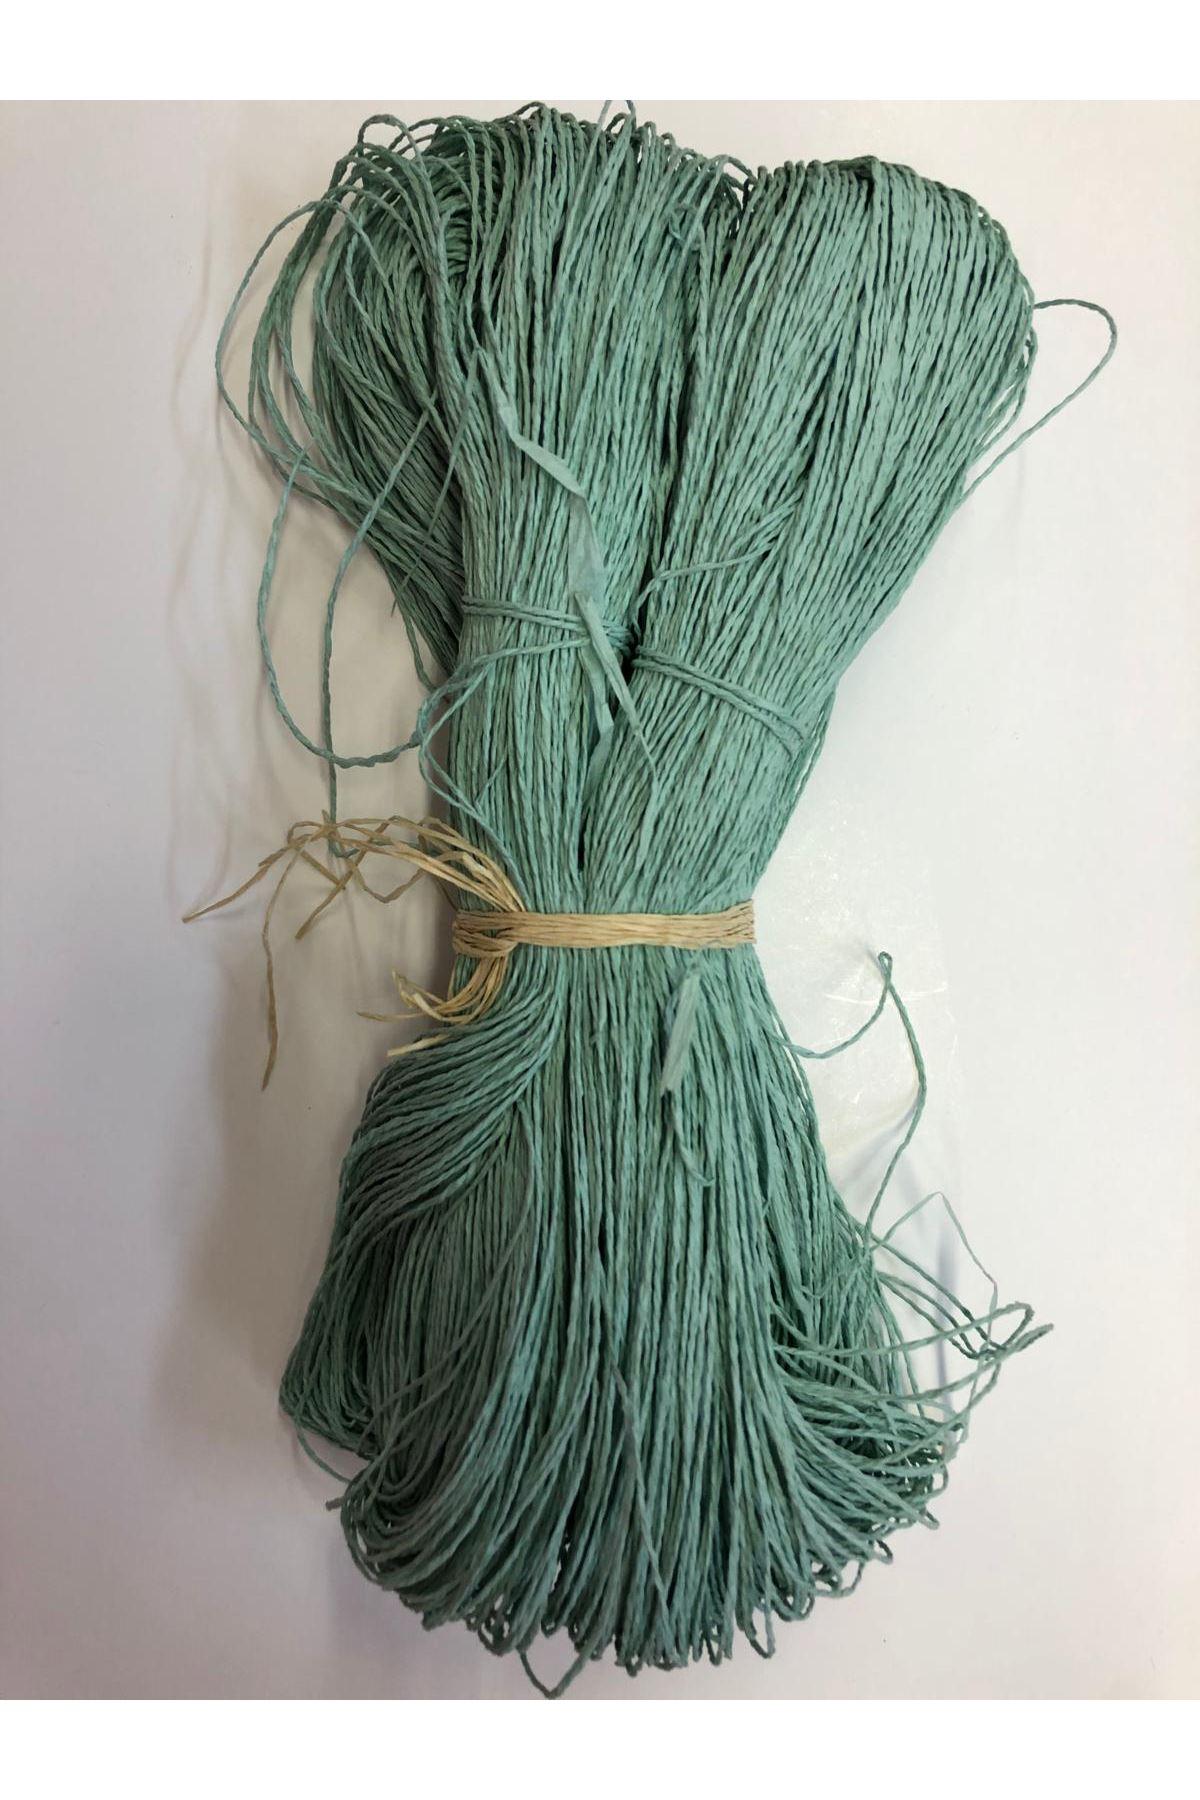 Kağıt İp Çağla Yeşili 512 gram